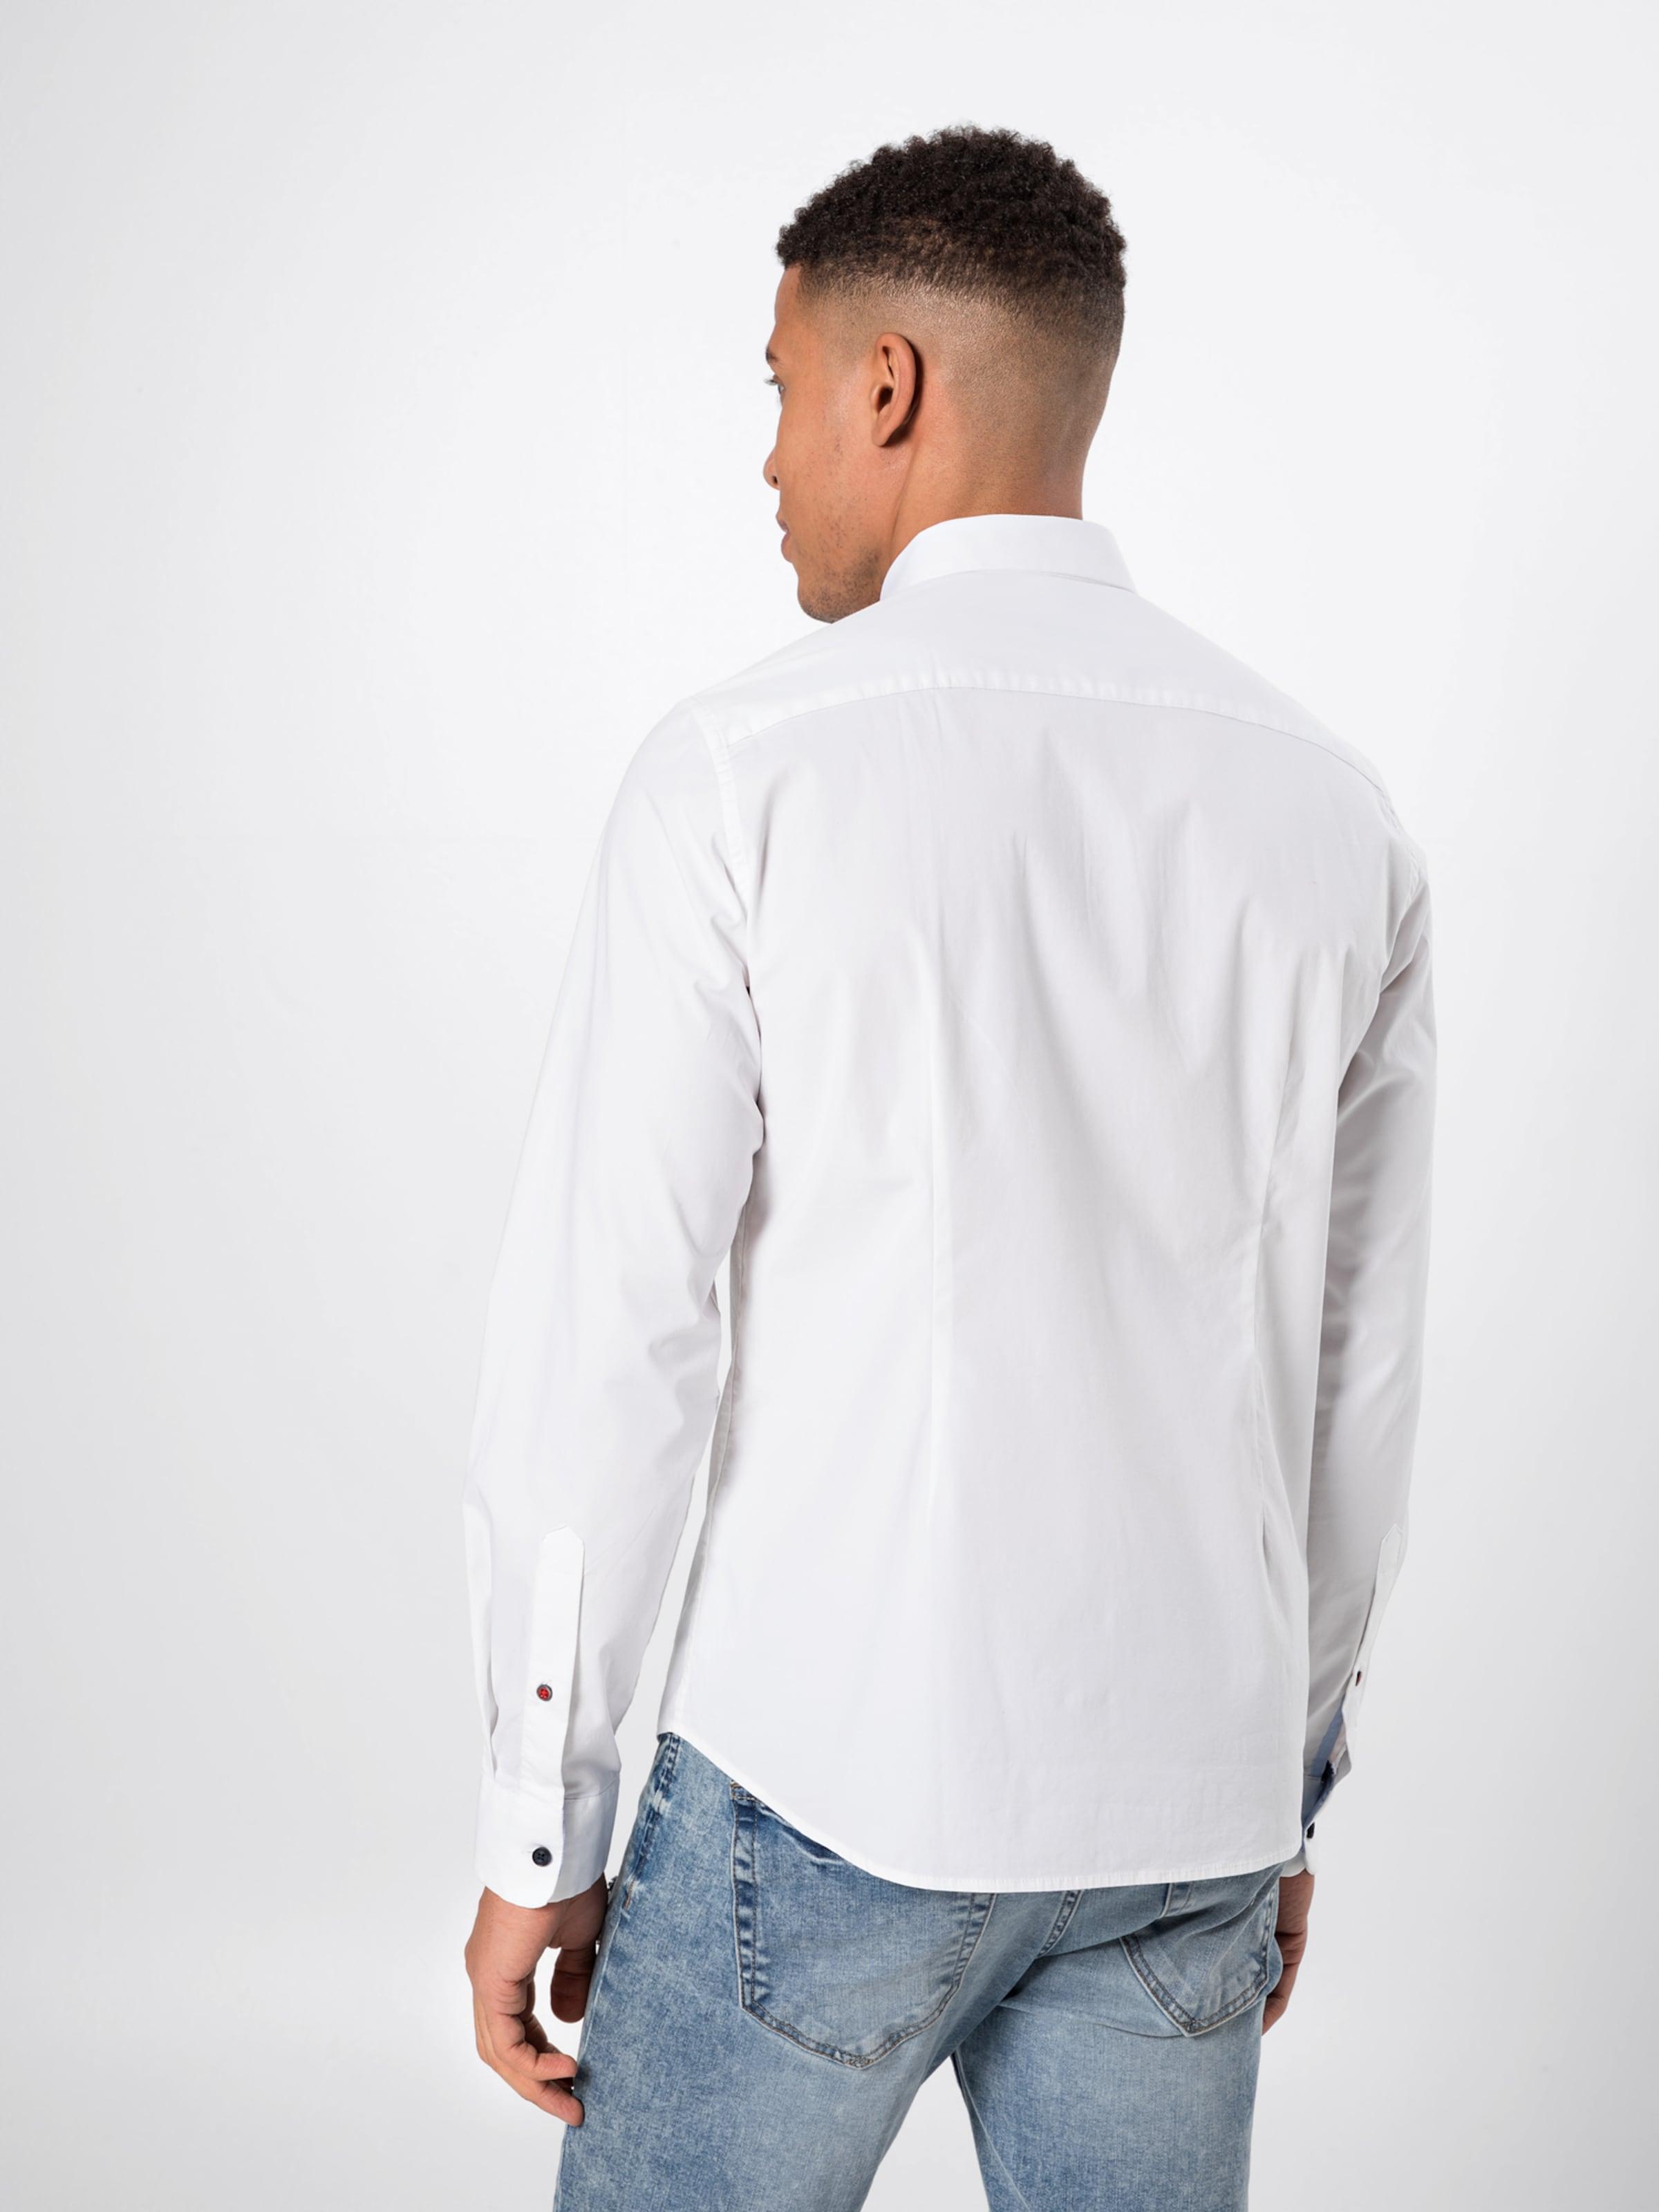 In Weiß Hemd oliver Red S Label erdxBCo